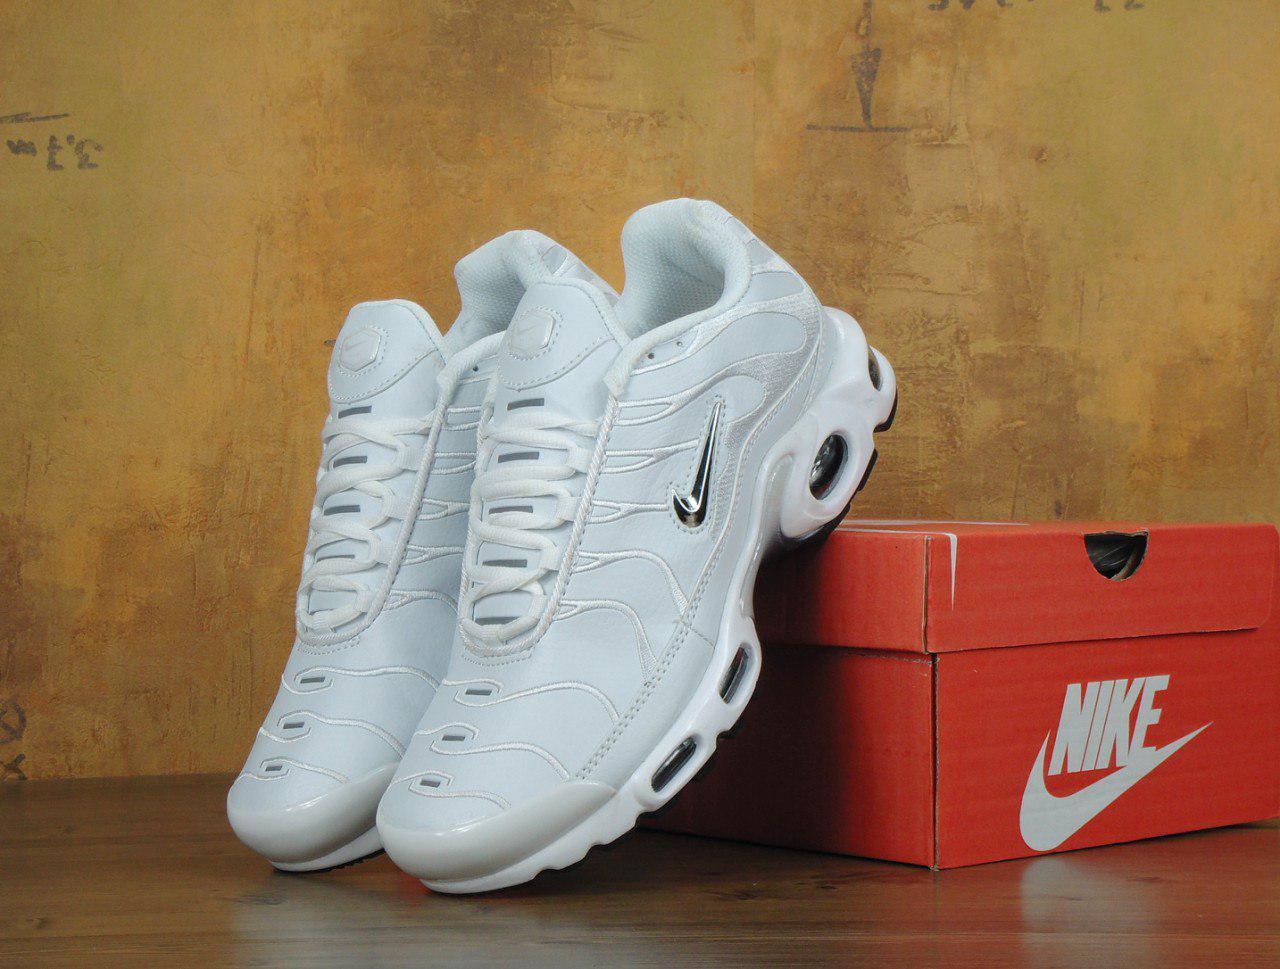 Мужские кроссовки Nike Air Max TN White топ реплика